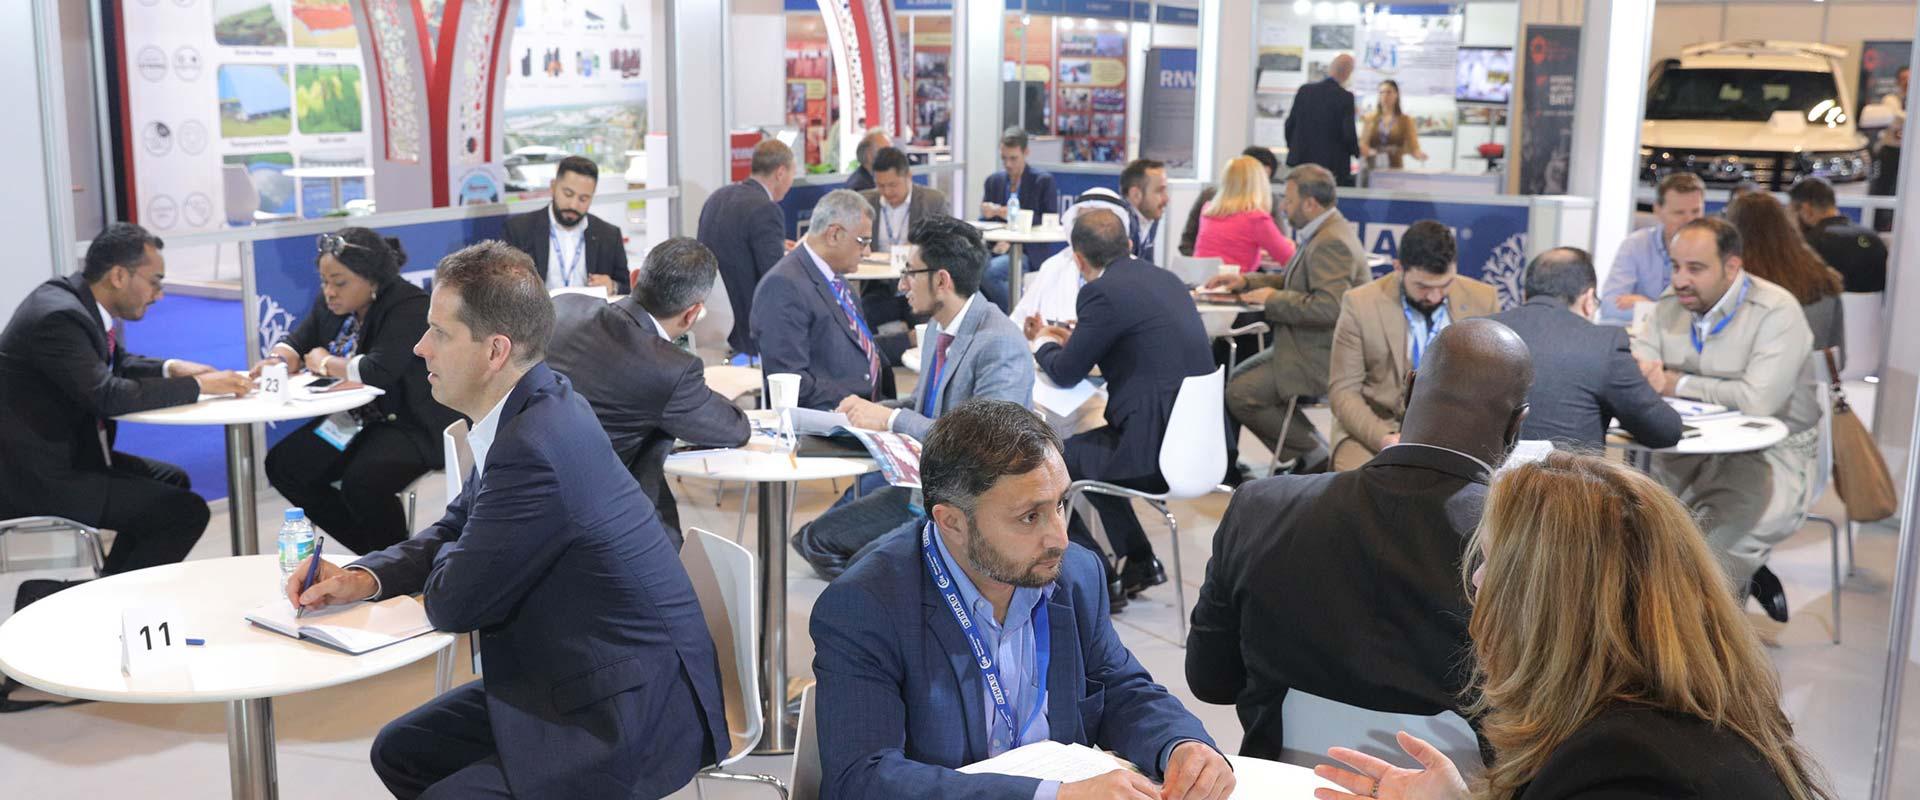 Dubai International Humanitarian Aid & Development Conference & Exhibition – DIHAD